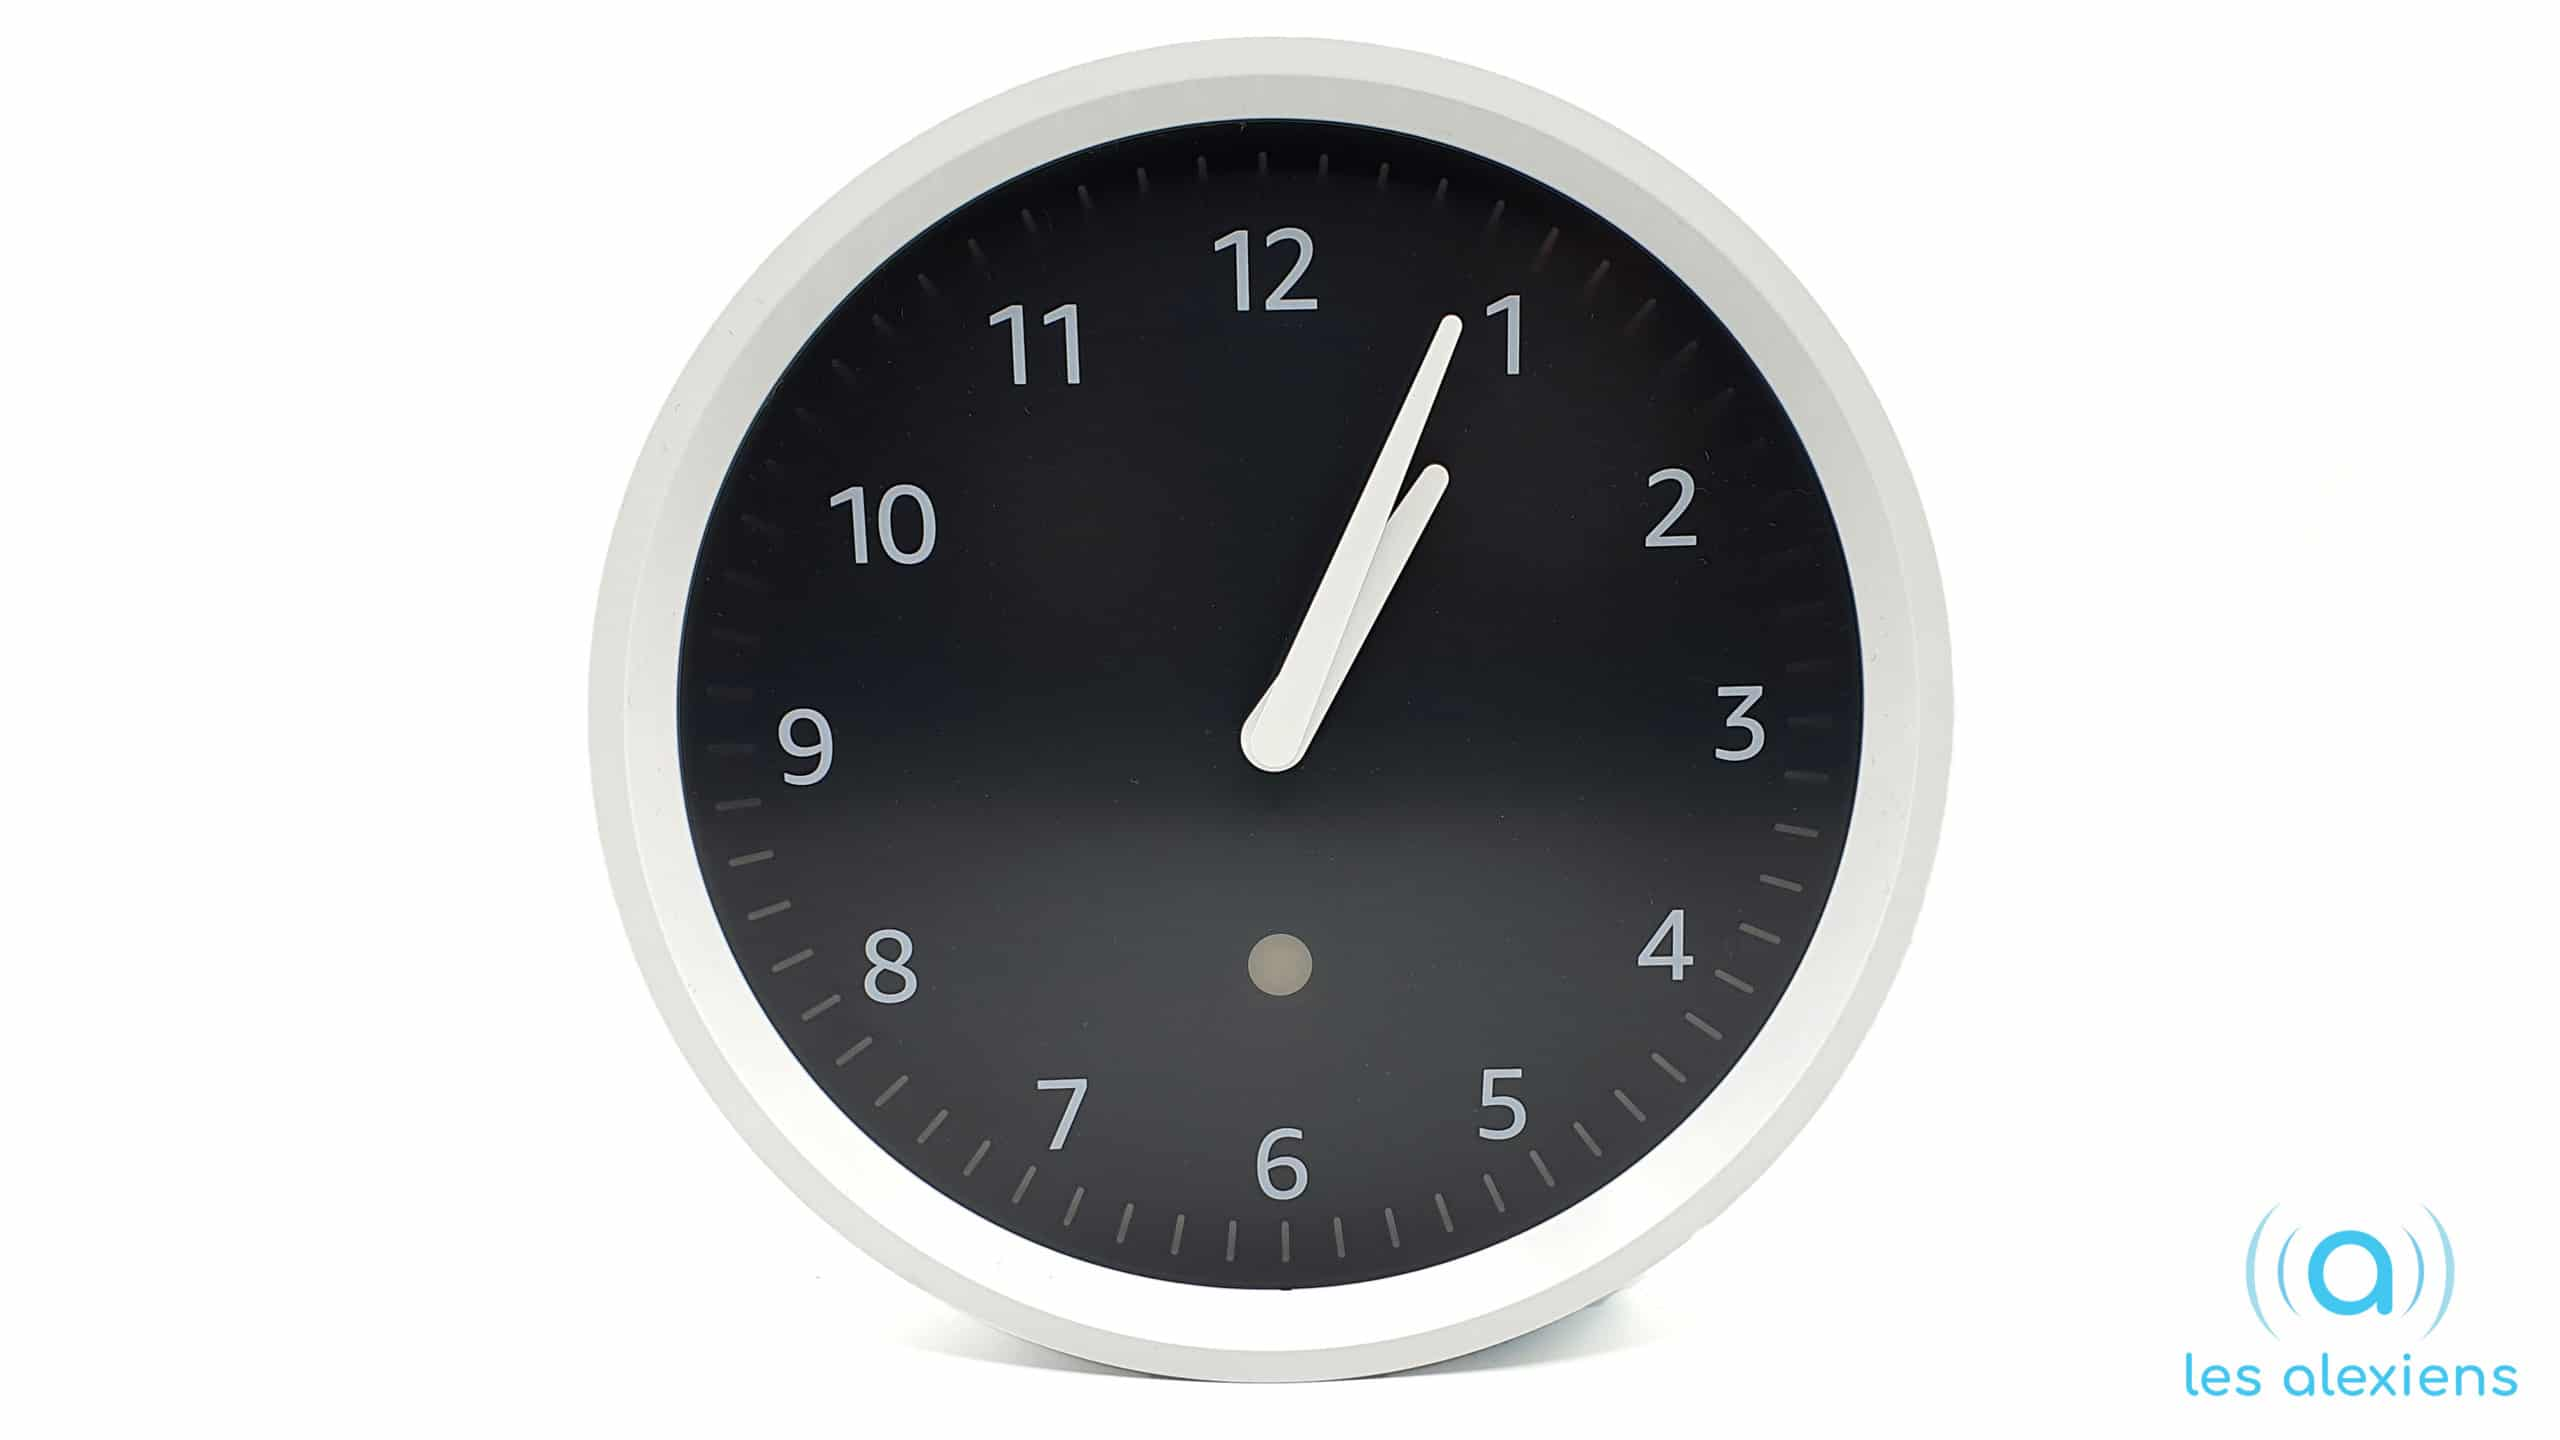 Amazon Echo Wall Clock - Horloge pendule compatible Alexa